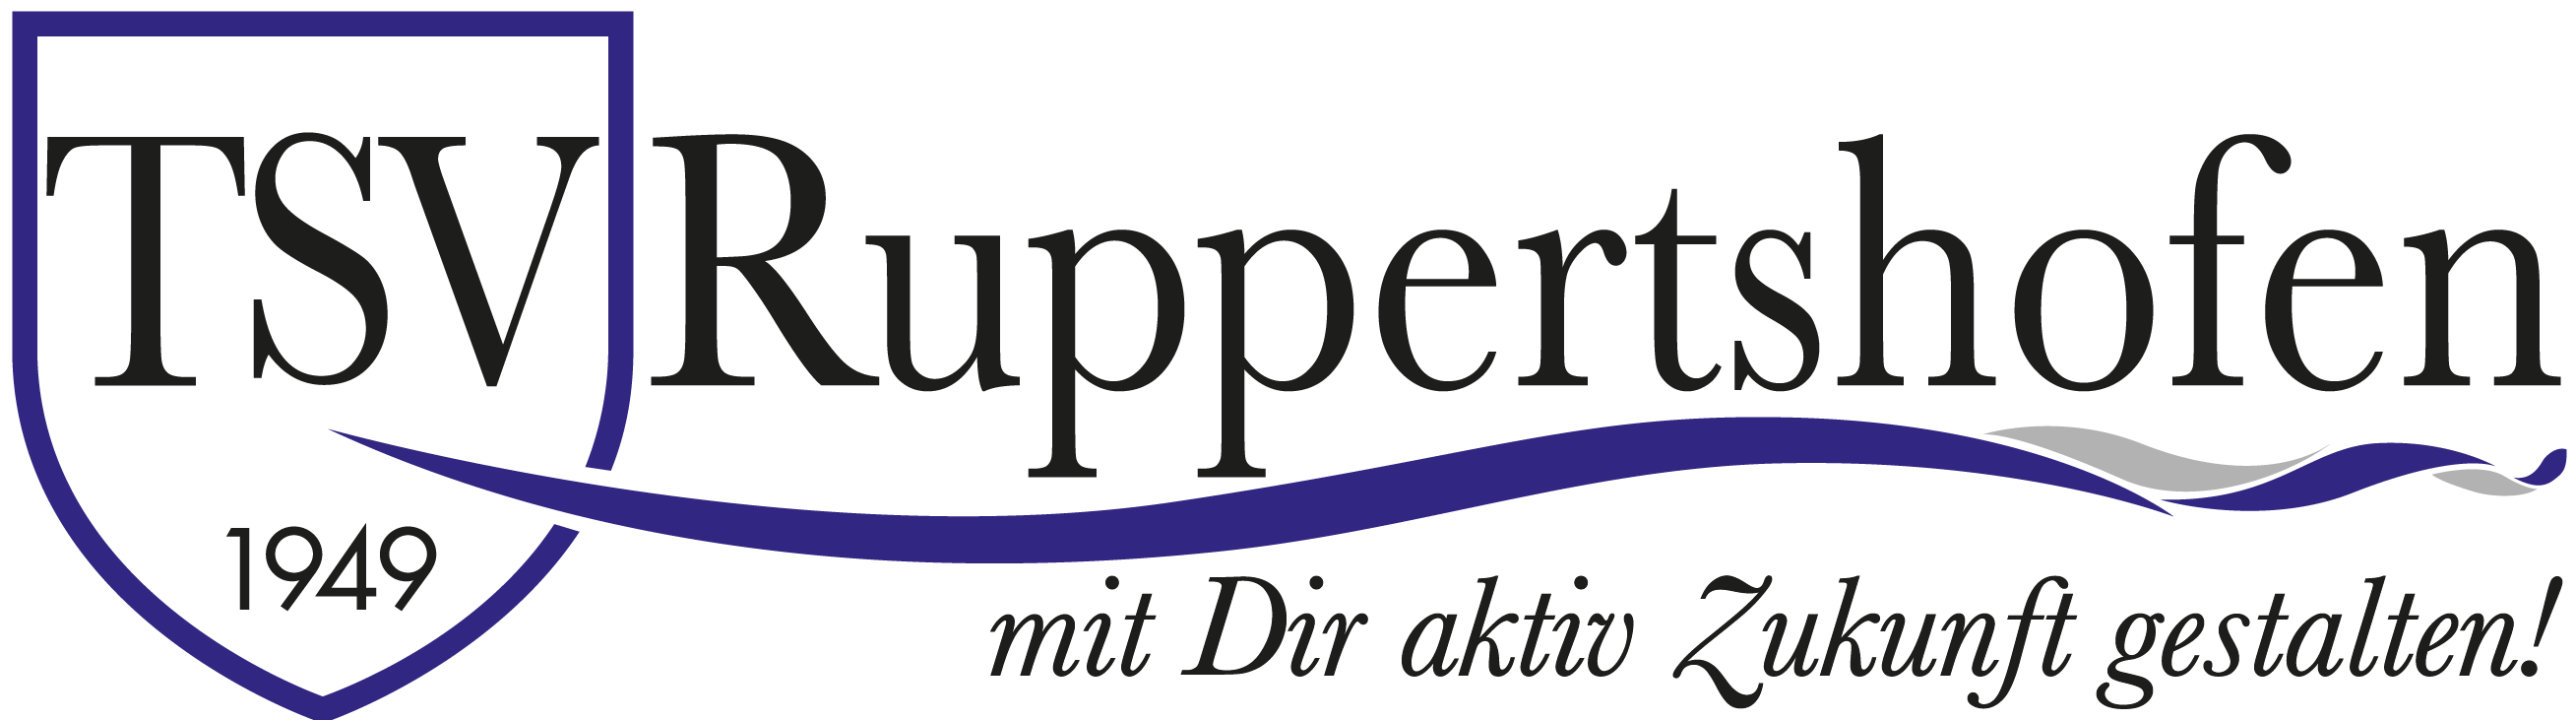 TSV Ruppertshofen